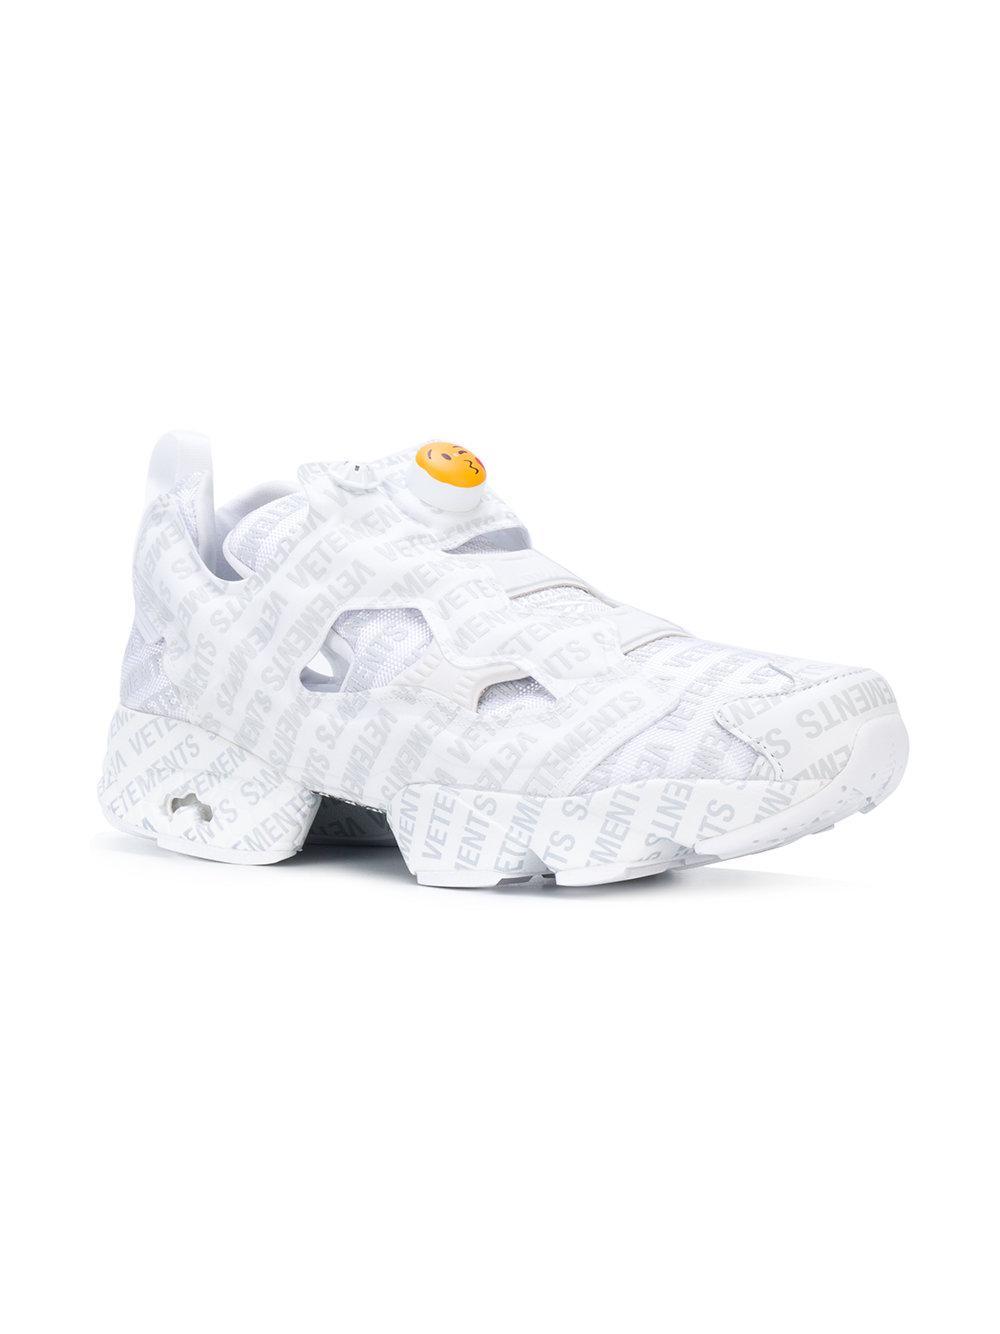 Vetements Instampump Logo Sneakers in White - Lyst 947624c95